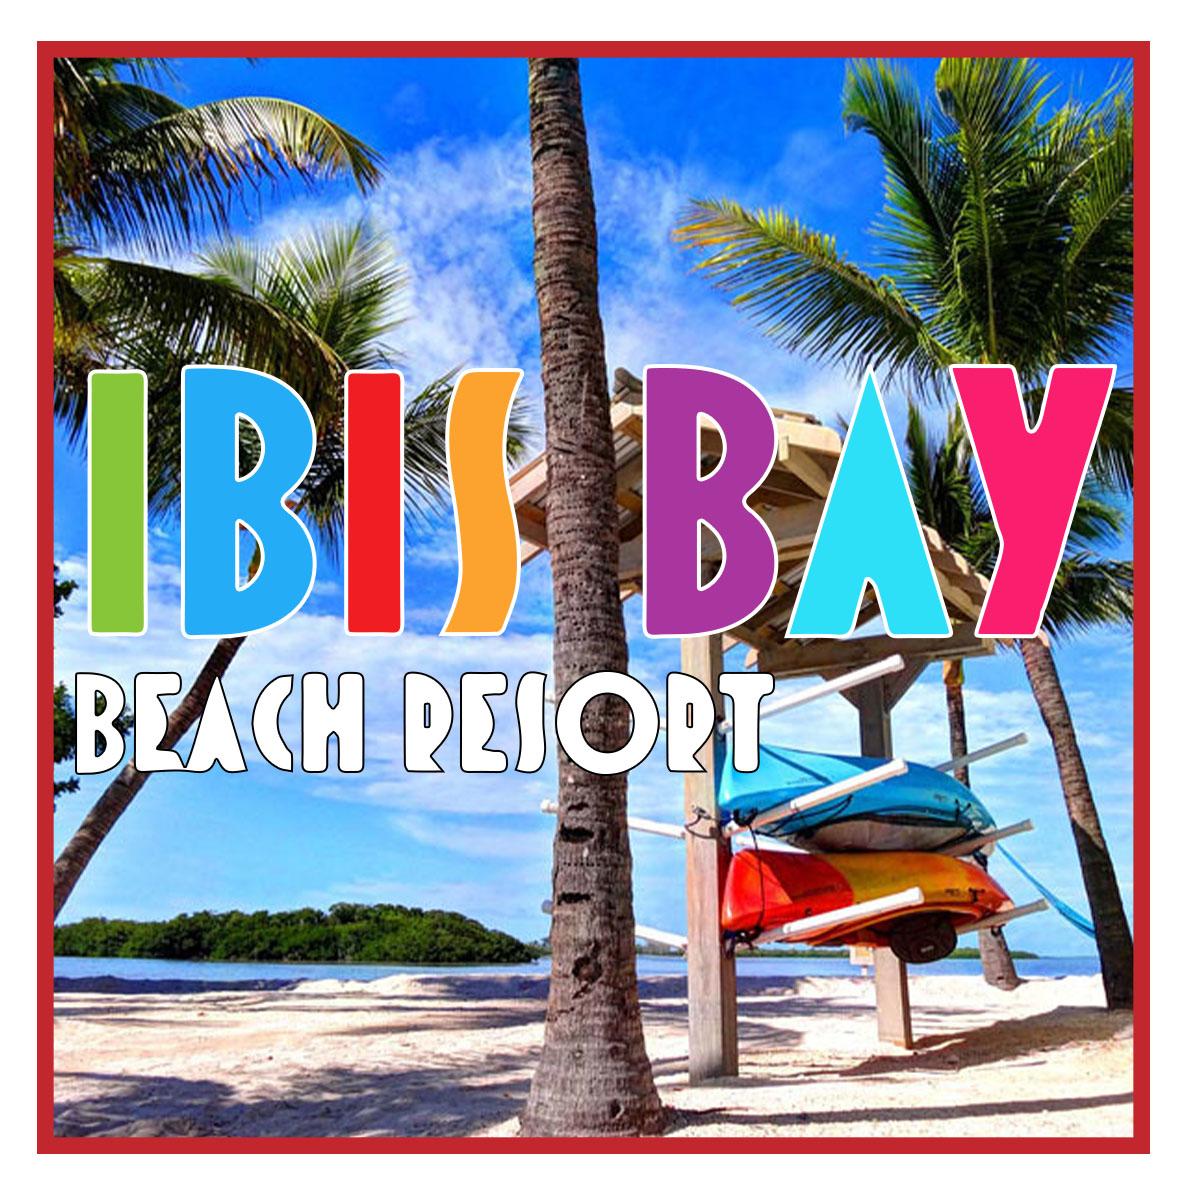 Ibis Bay Beach Resort